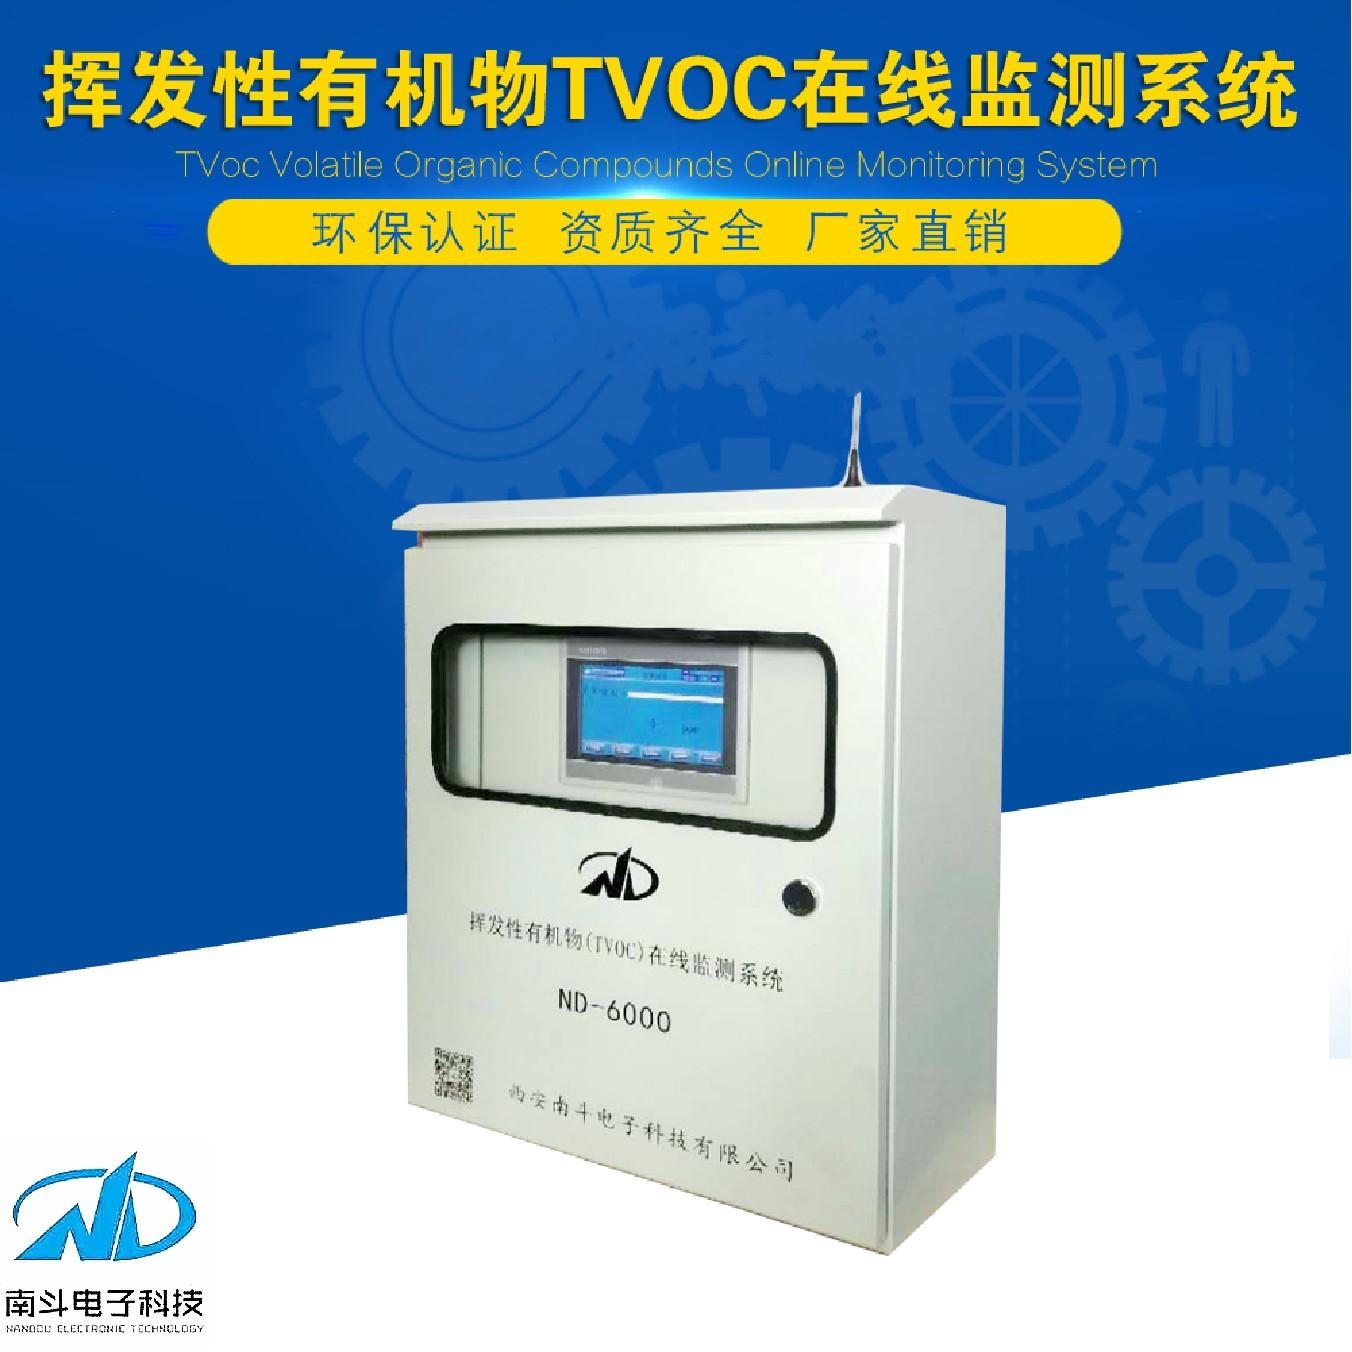 TVOC在线监测系统 大型的TVOC在线监测设备公司 高性能